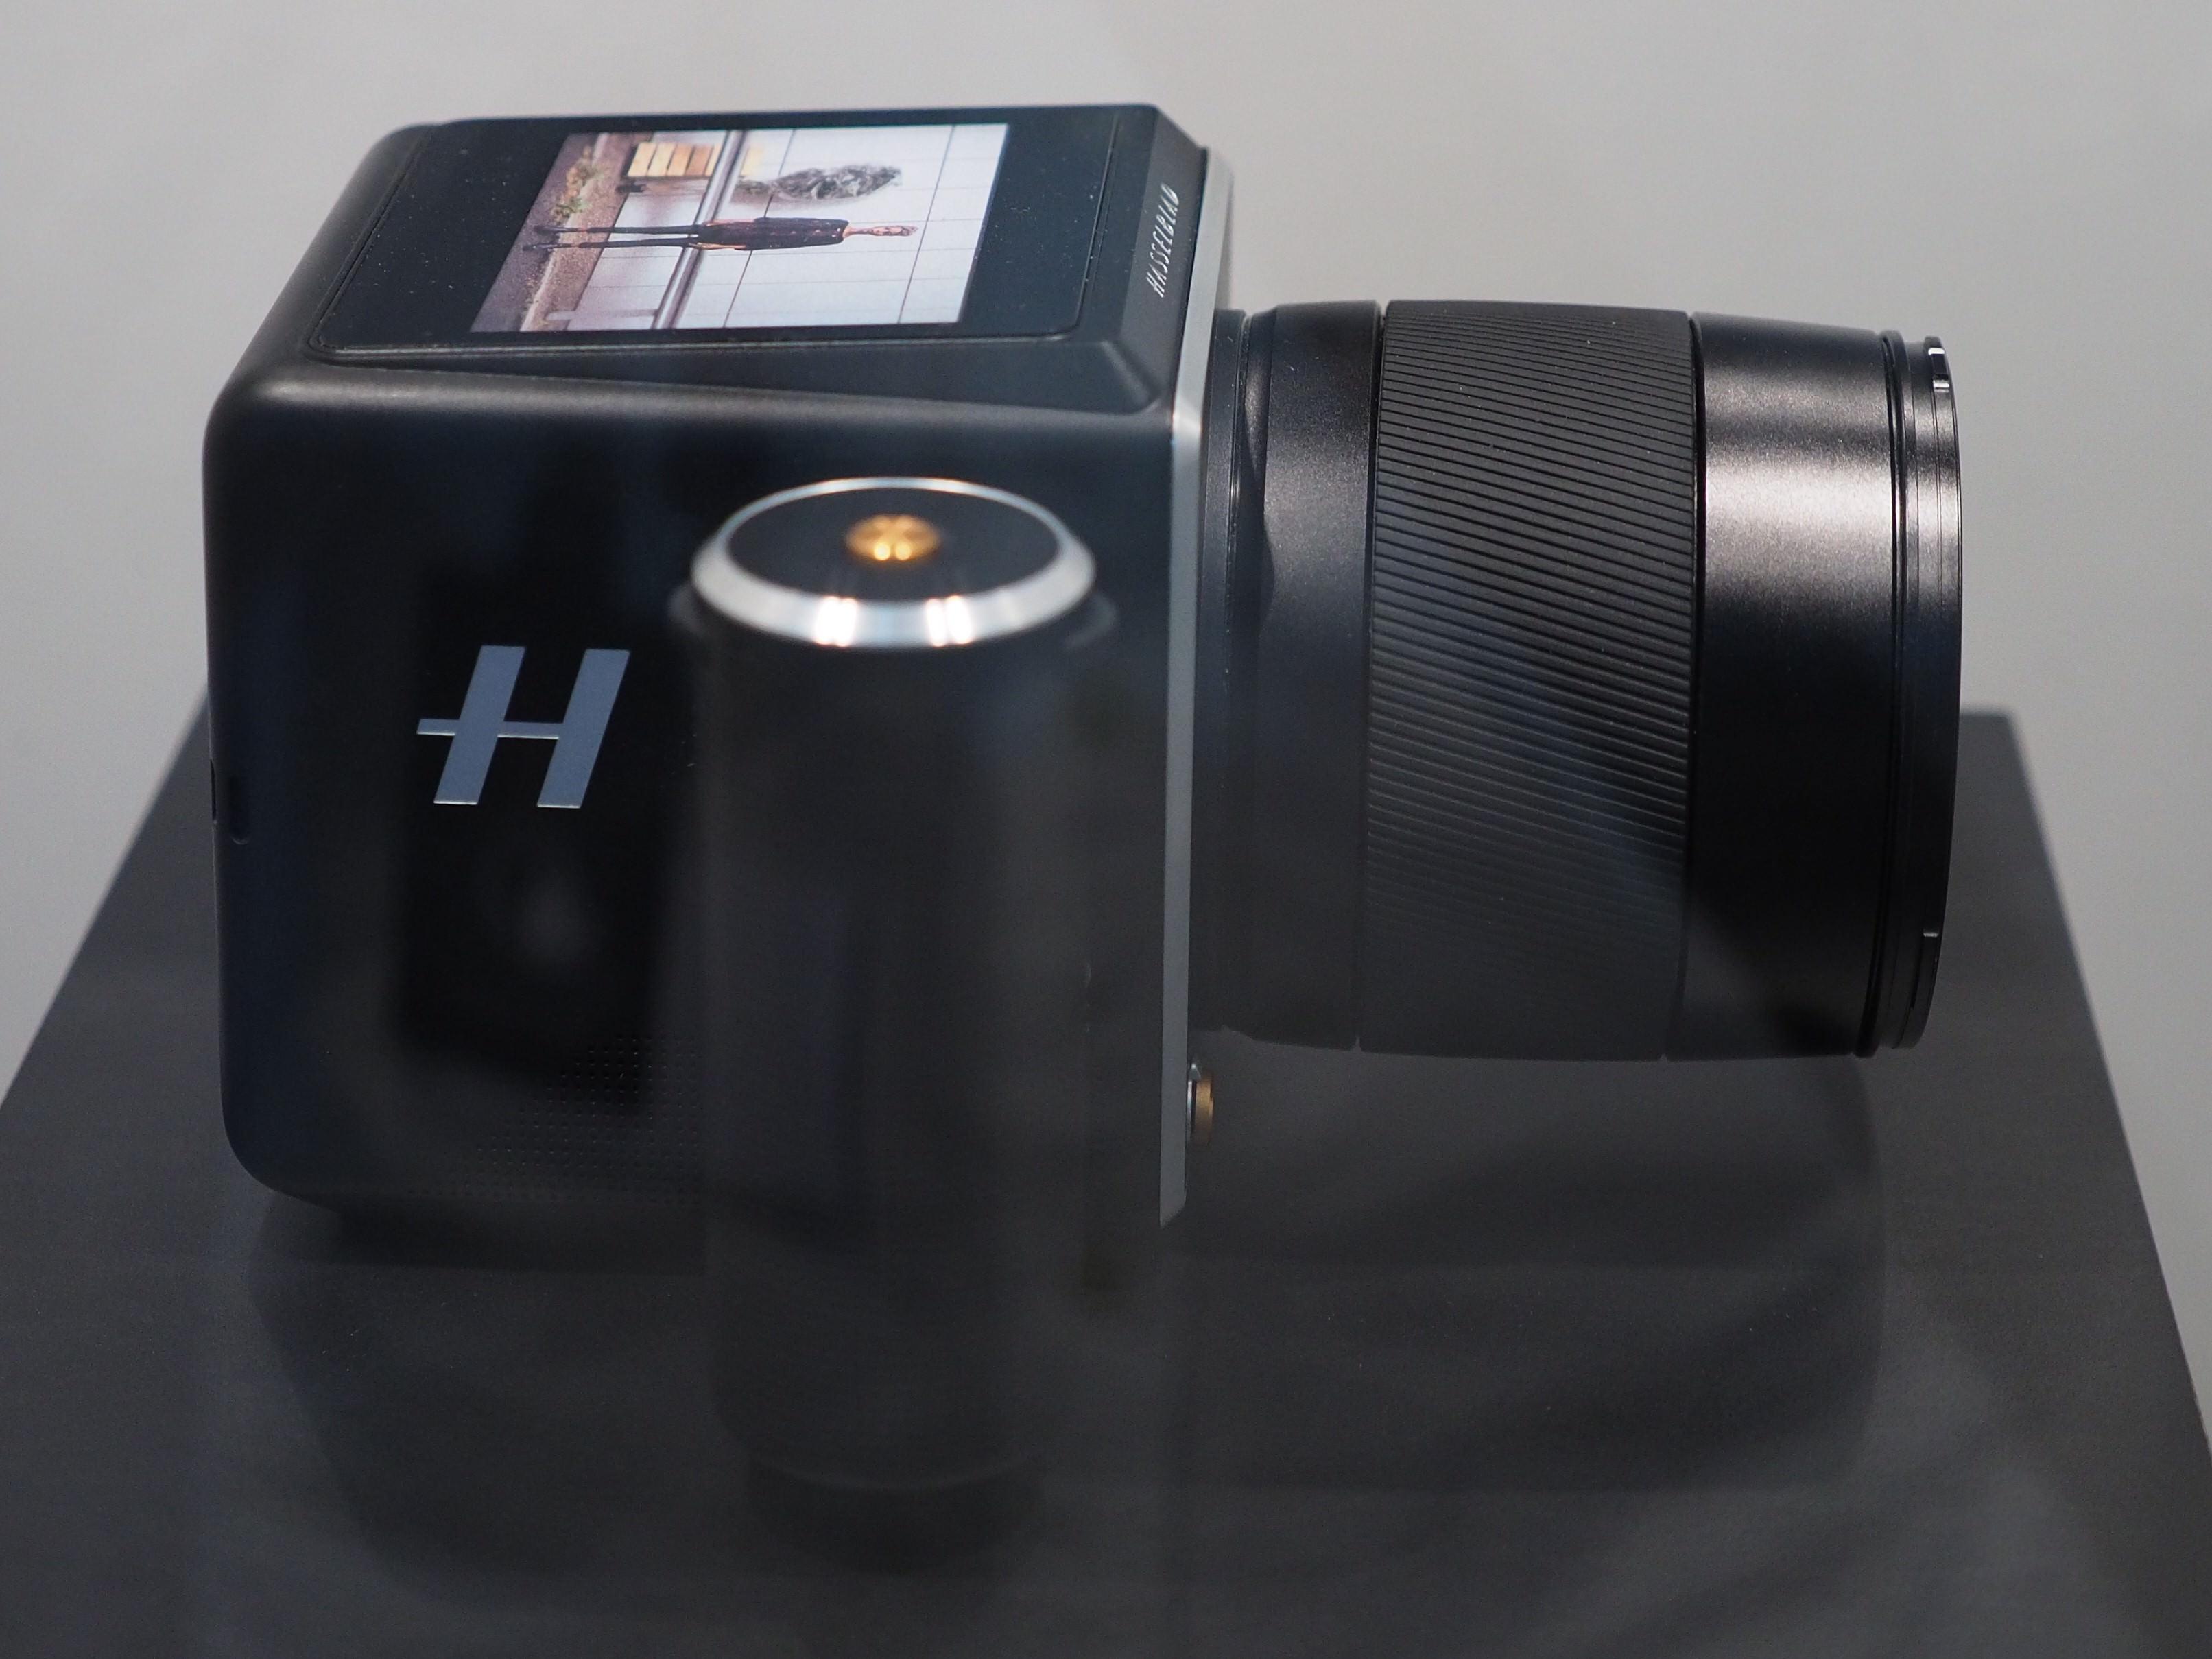 Hasselblad X1D 4116 Edition and V1D Prototype   ePHOTOzine